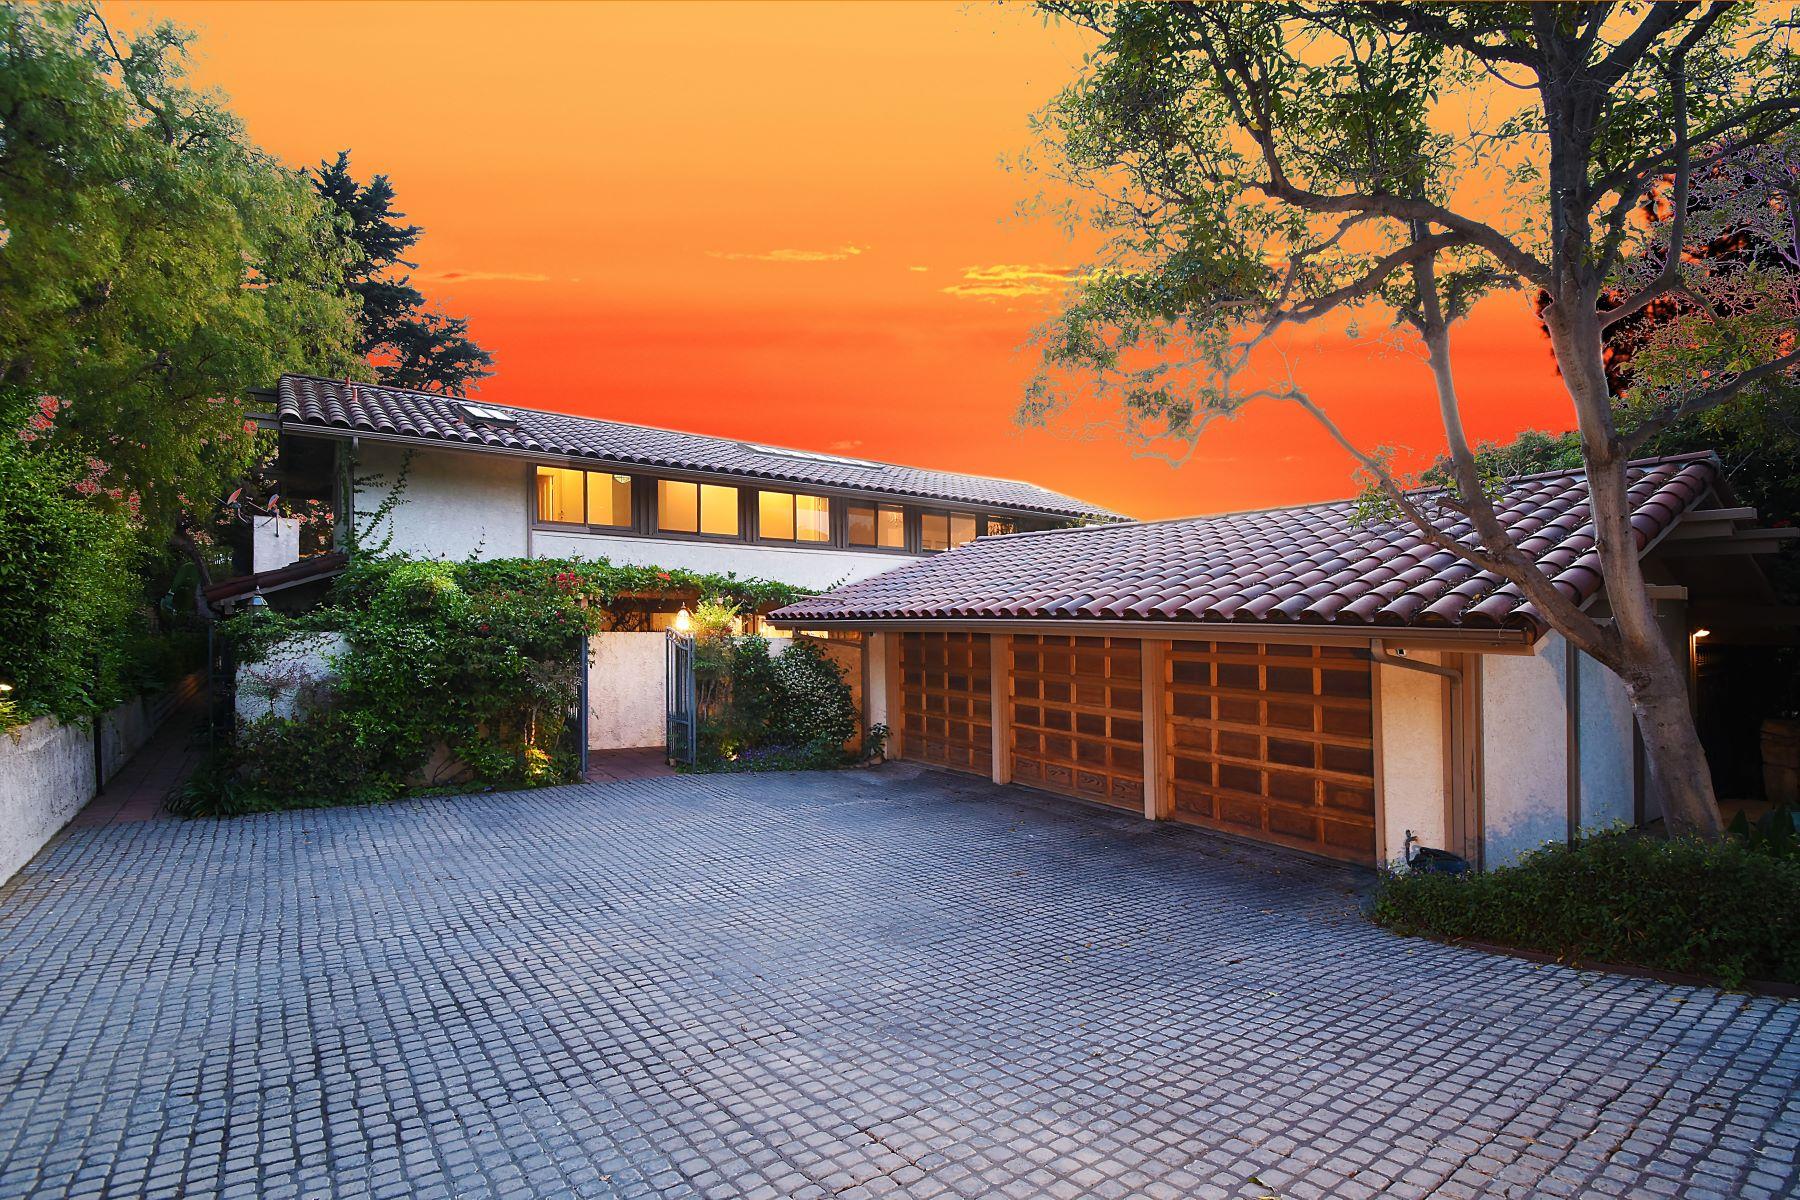 Single Family Homes for Sale at 1103 Via Curva, Palos Verdes Estates, CA 90274 1103 Via Curva Palos Verdes Estates, California 90274 United States